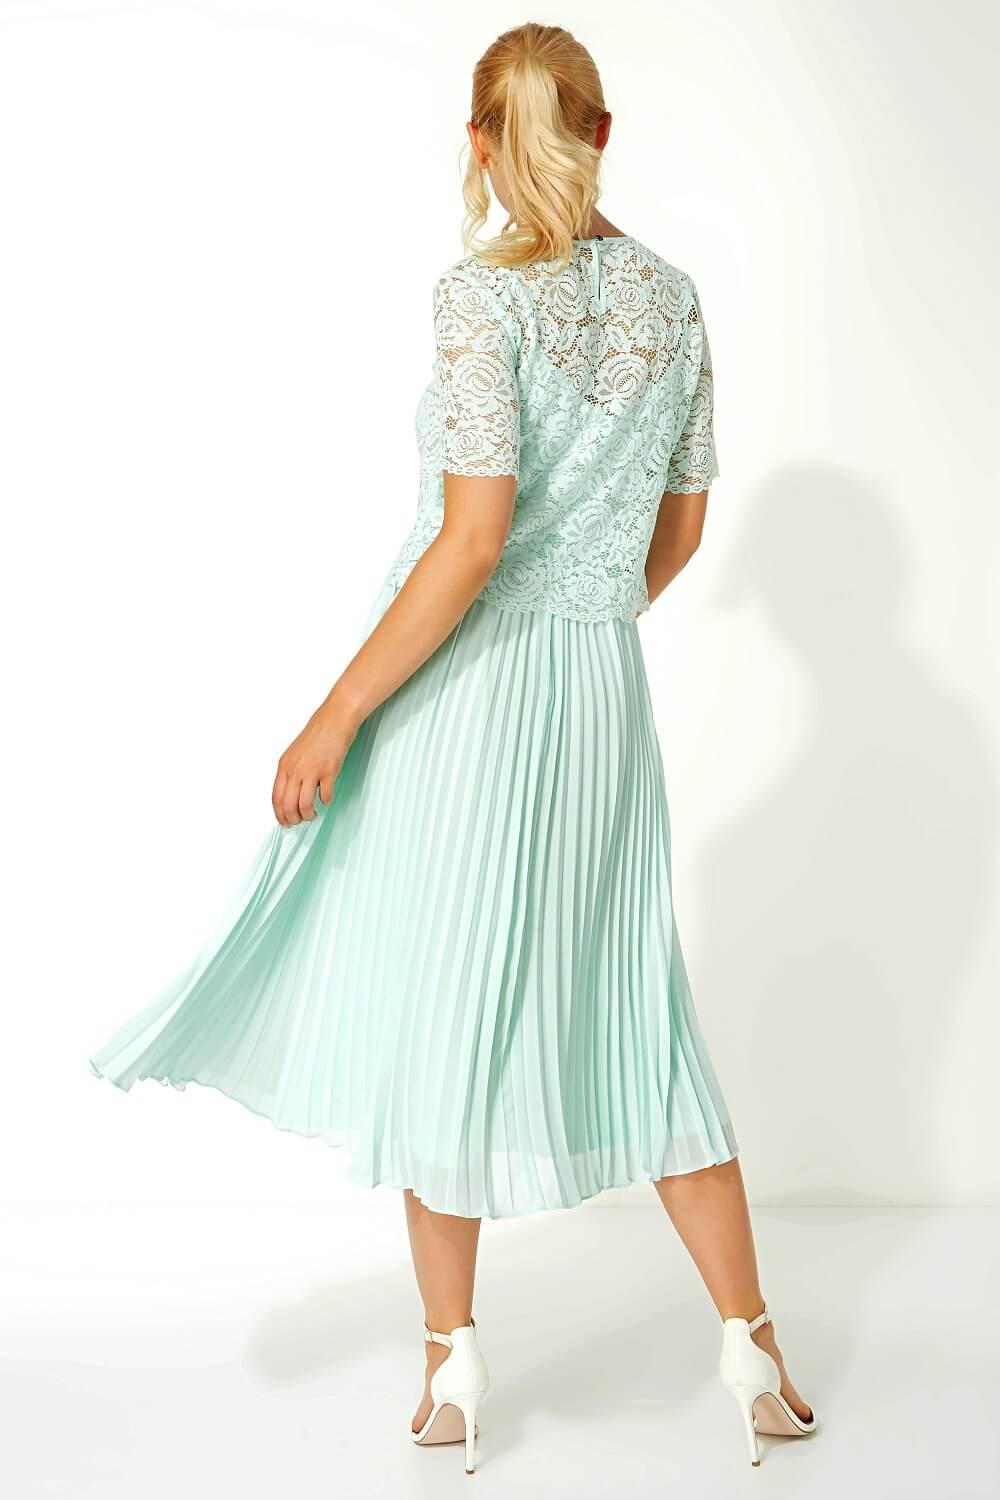 Roman-Originals-Women-Lace-Top-Overlay-Pleated-Dress thumbnail 36